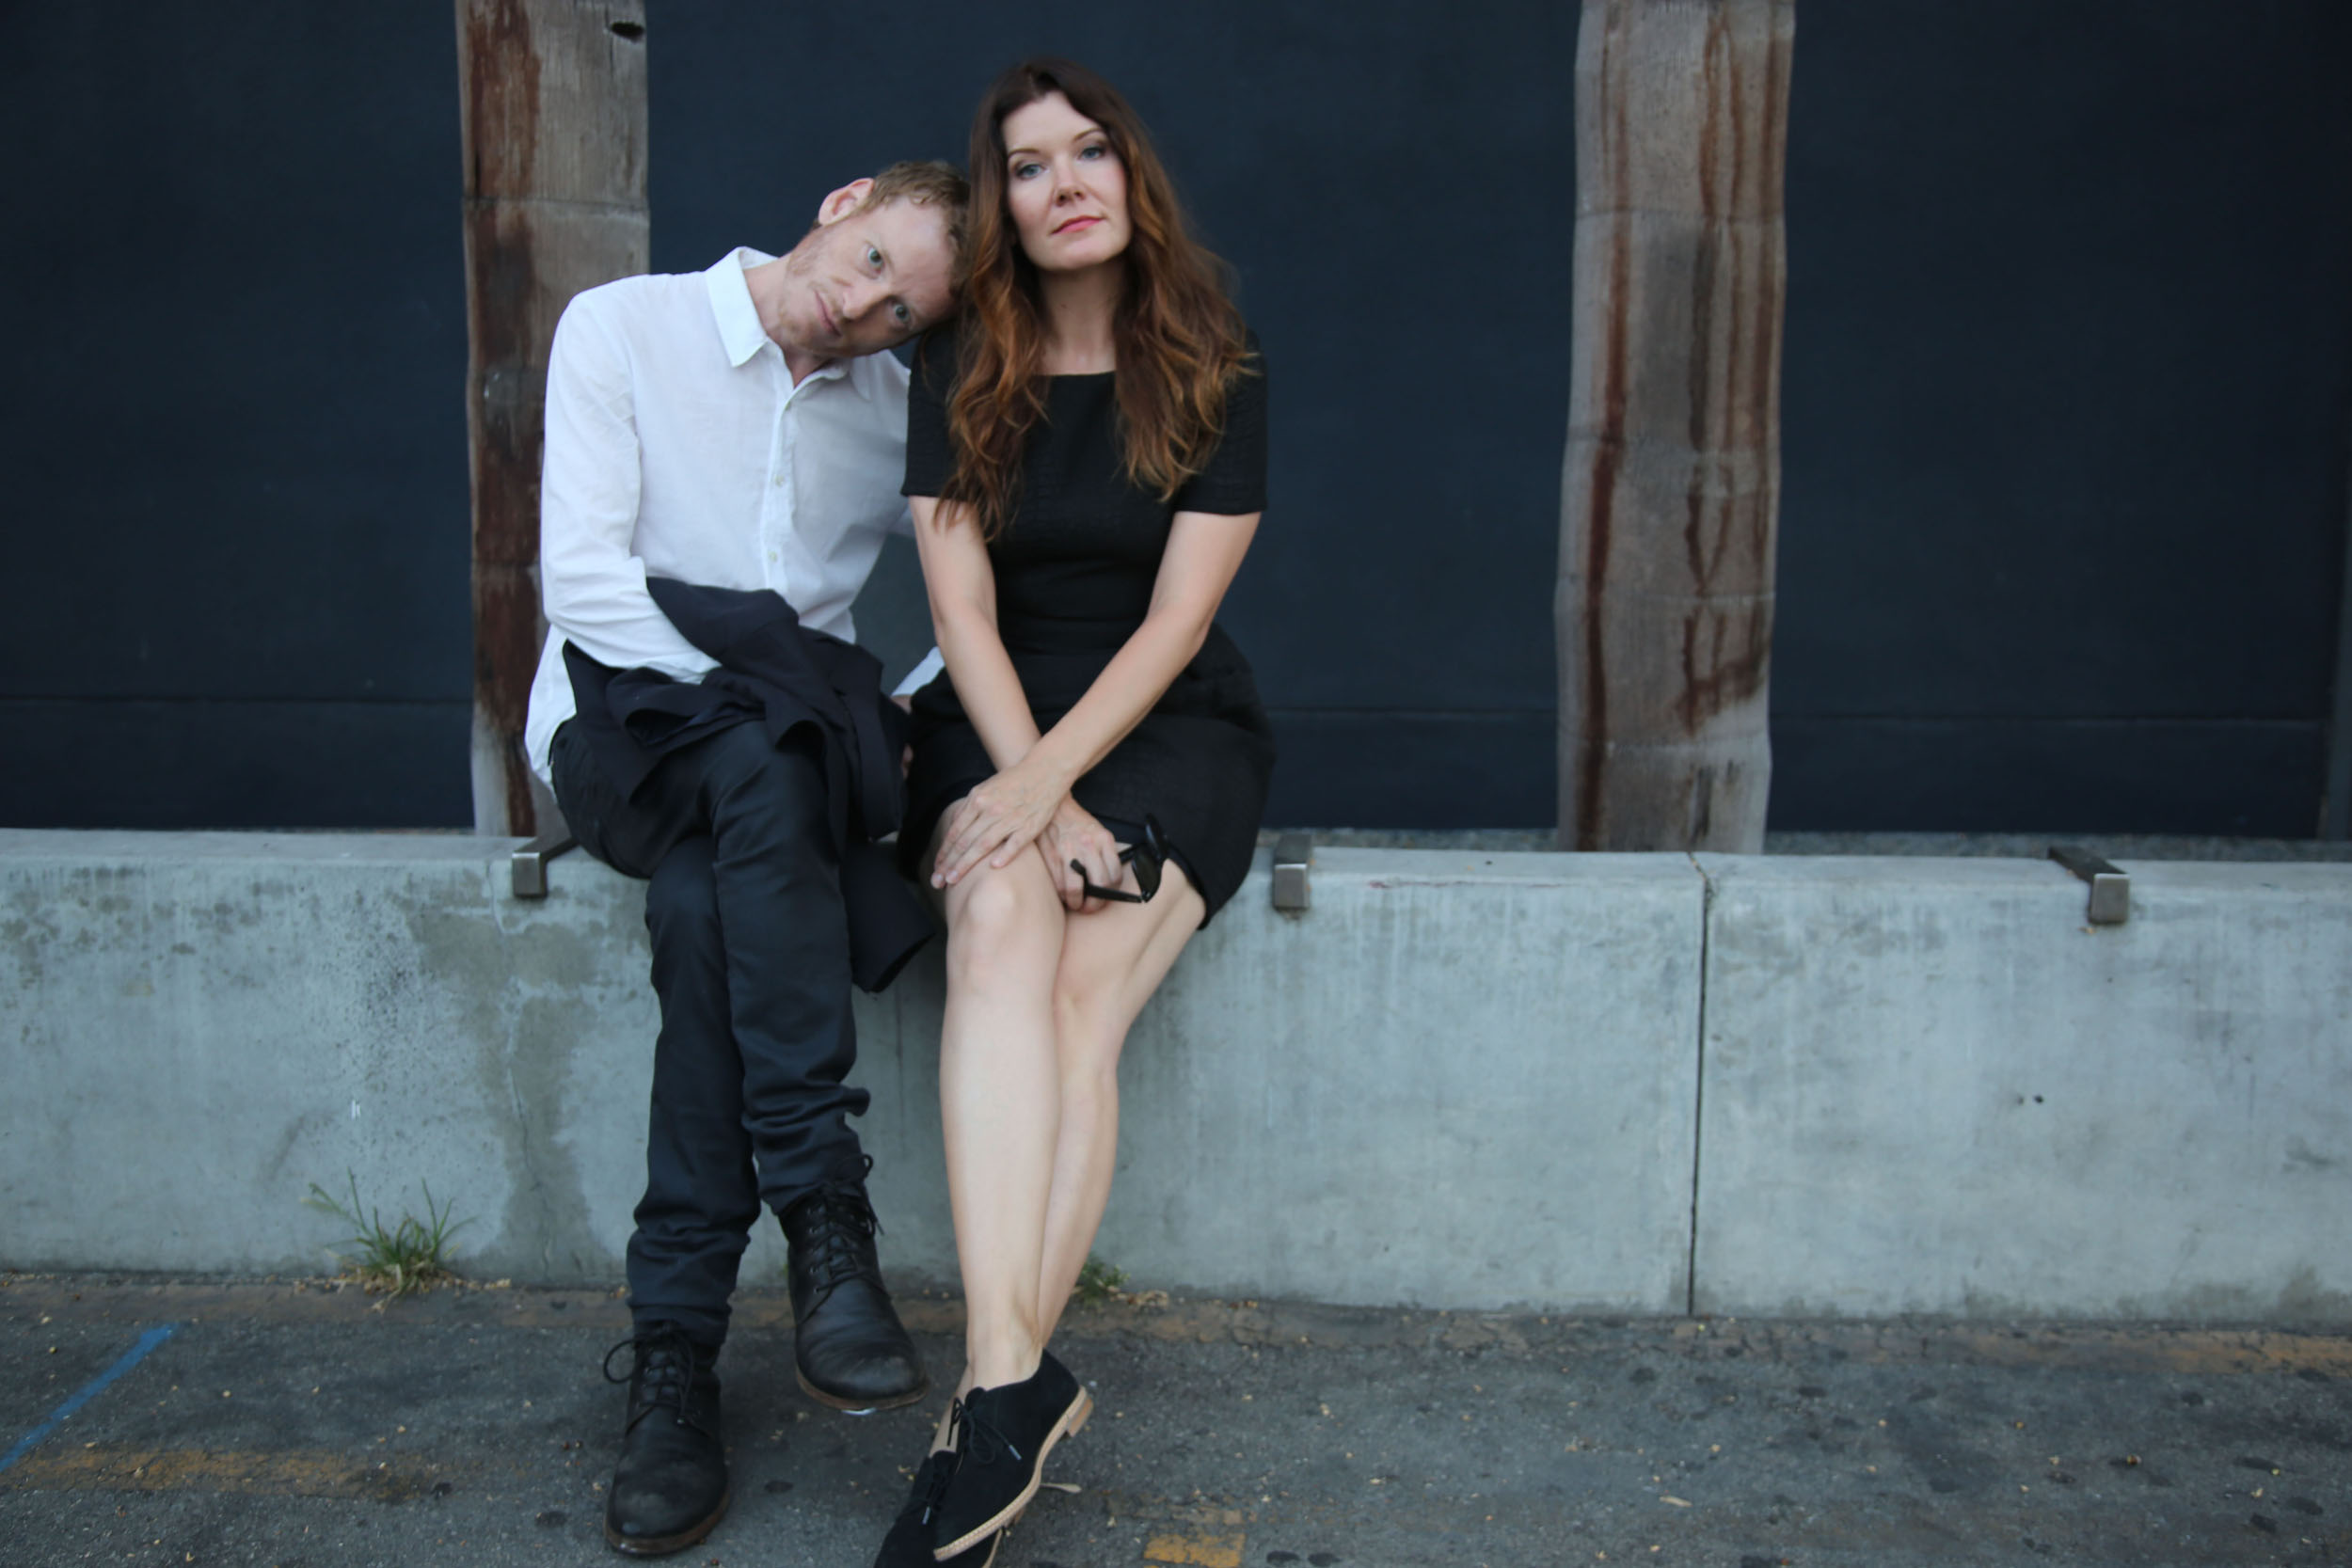 MIXTAPE: Kelly Jones and Teddy Thompson's Favorite Duets